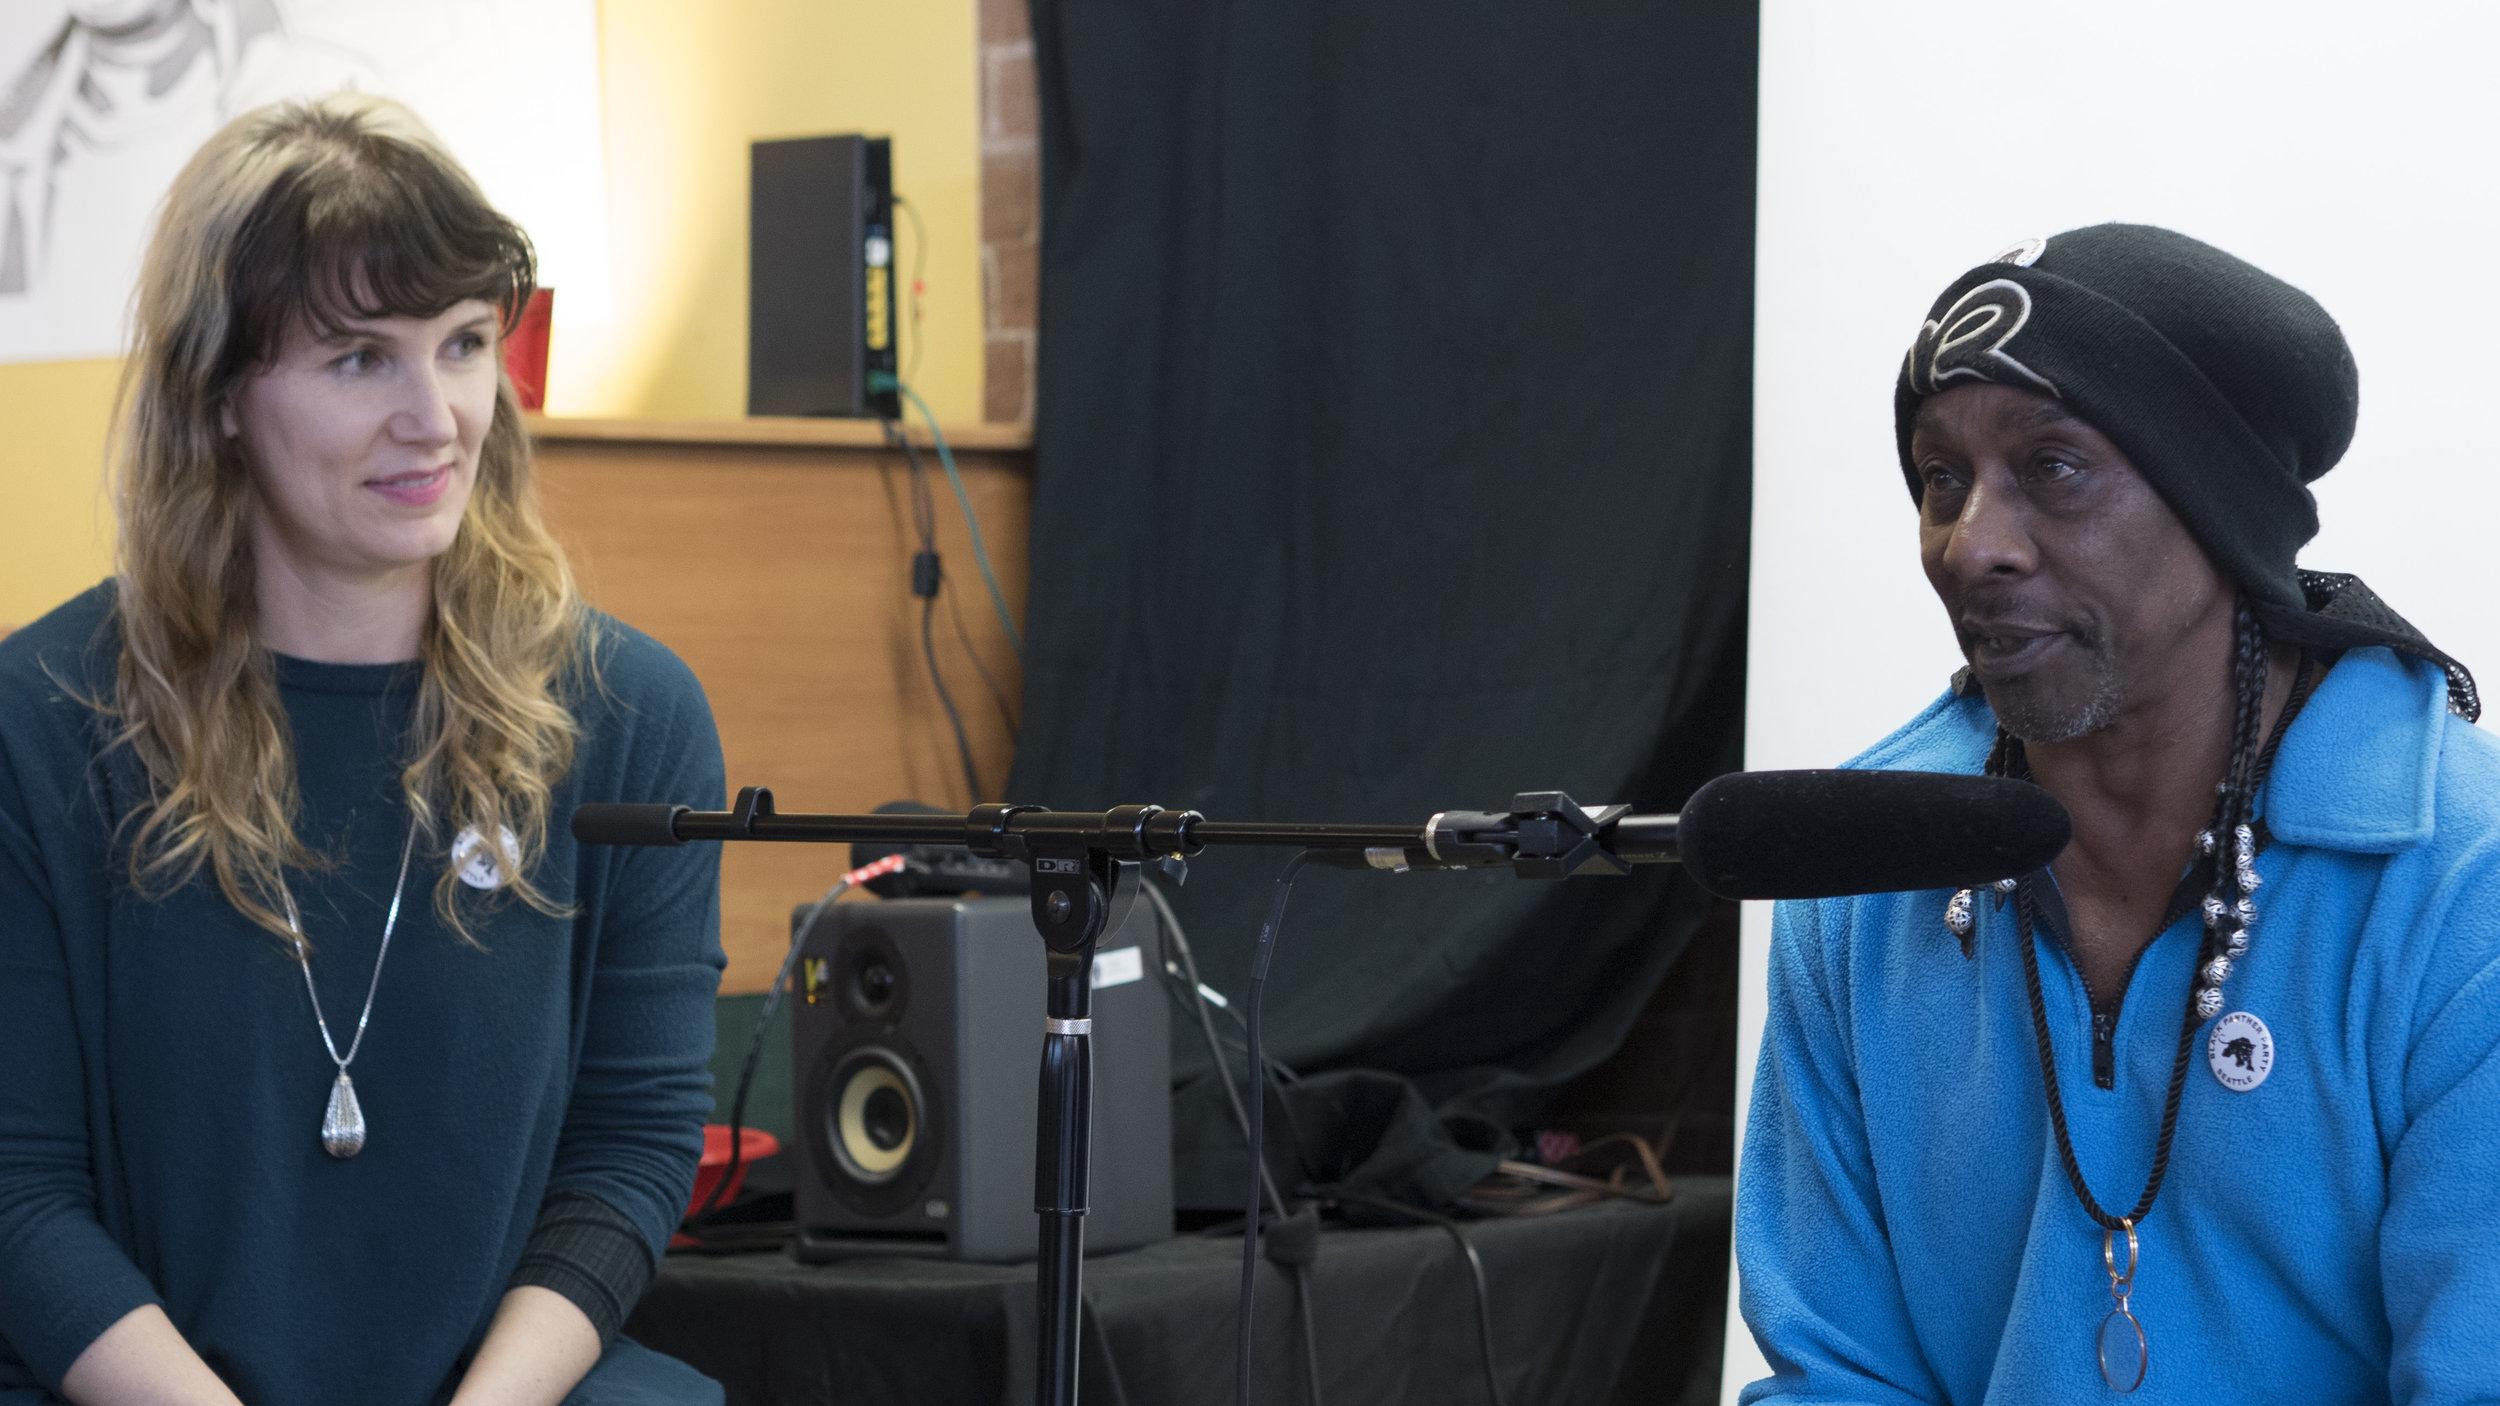 Rachel Kessler interviews Robbie Hill at the Shelf Life Open House